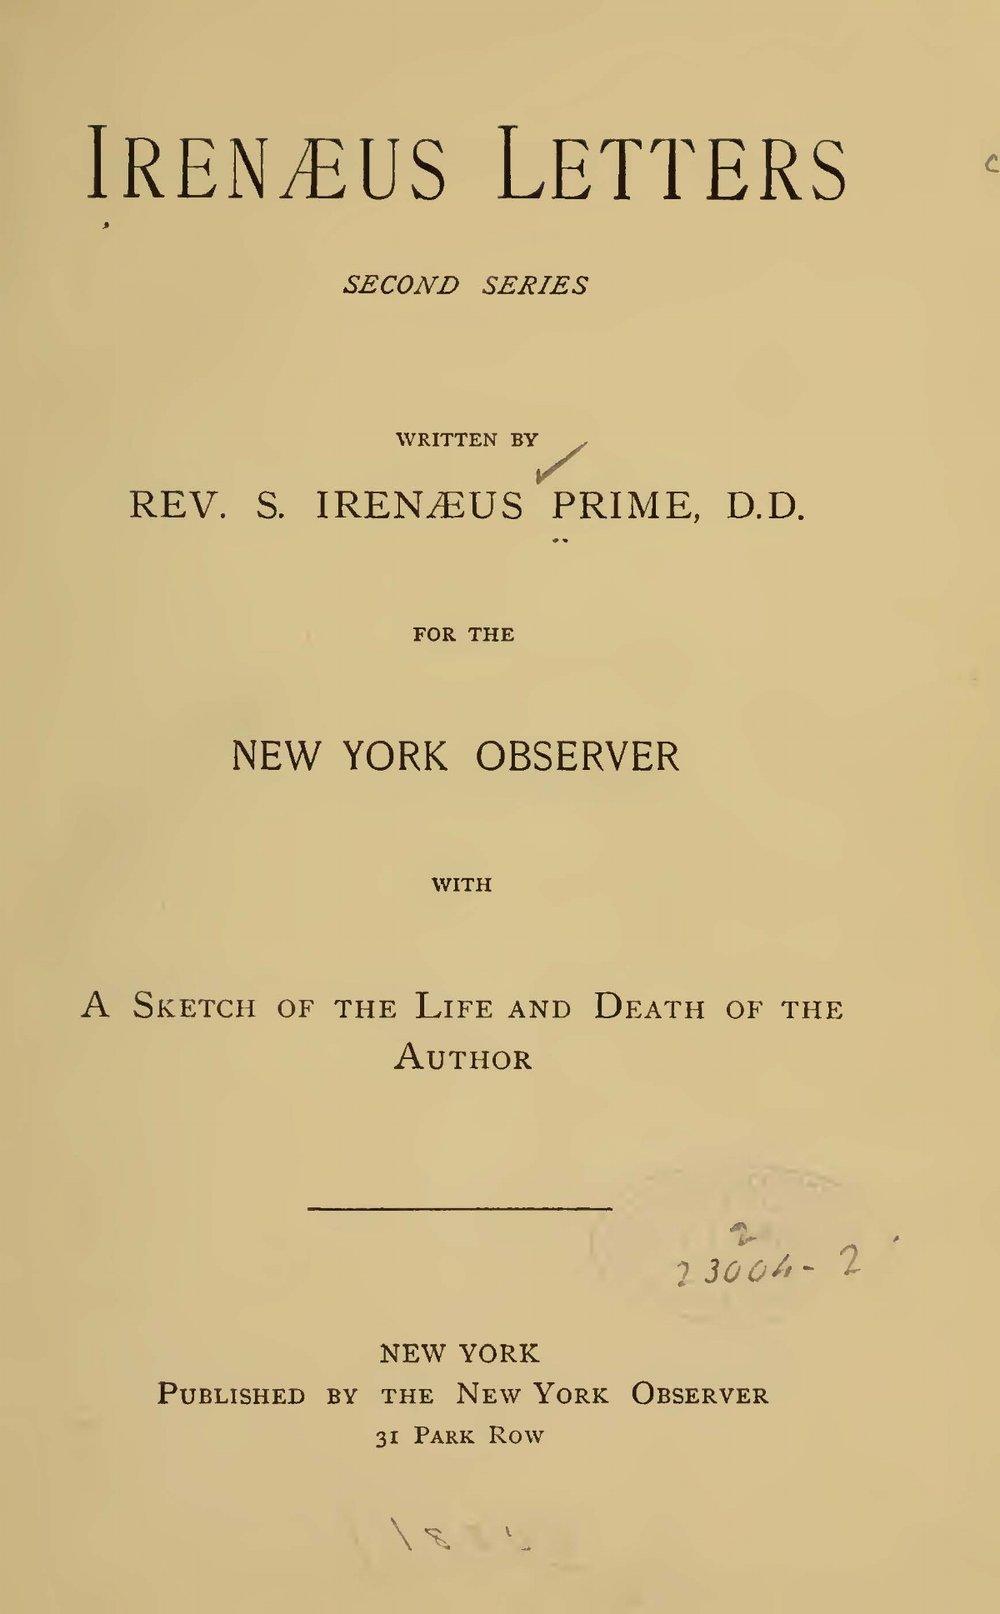 Prime, Samuel Irenaeus, Irenaeus Letters Second Series Title Page.jpg